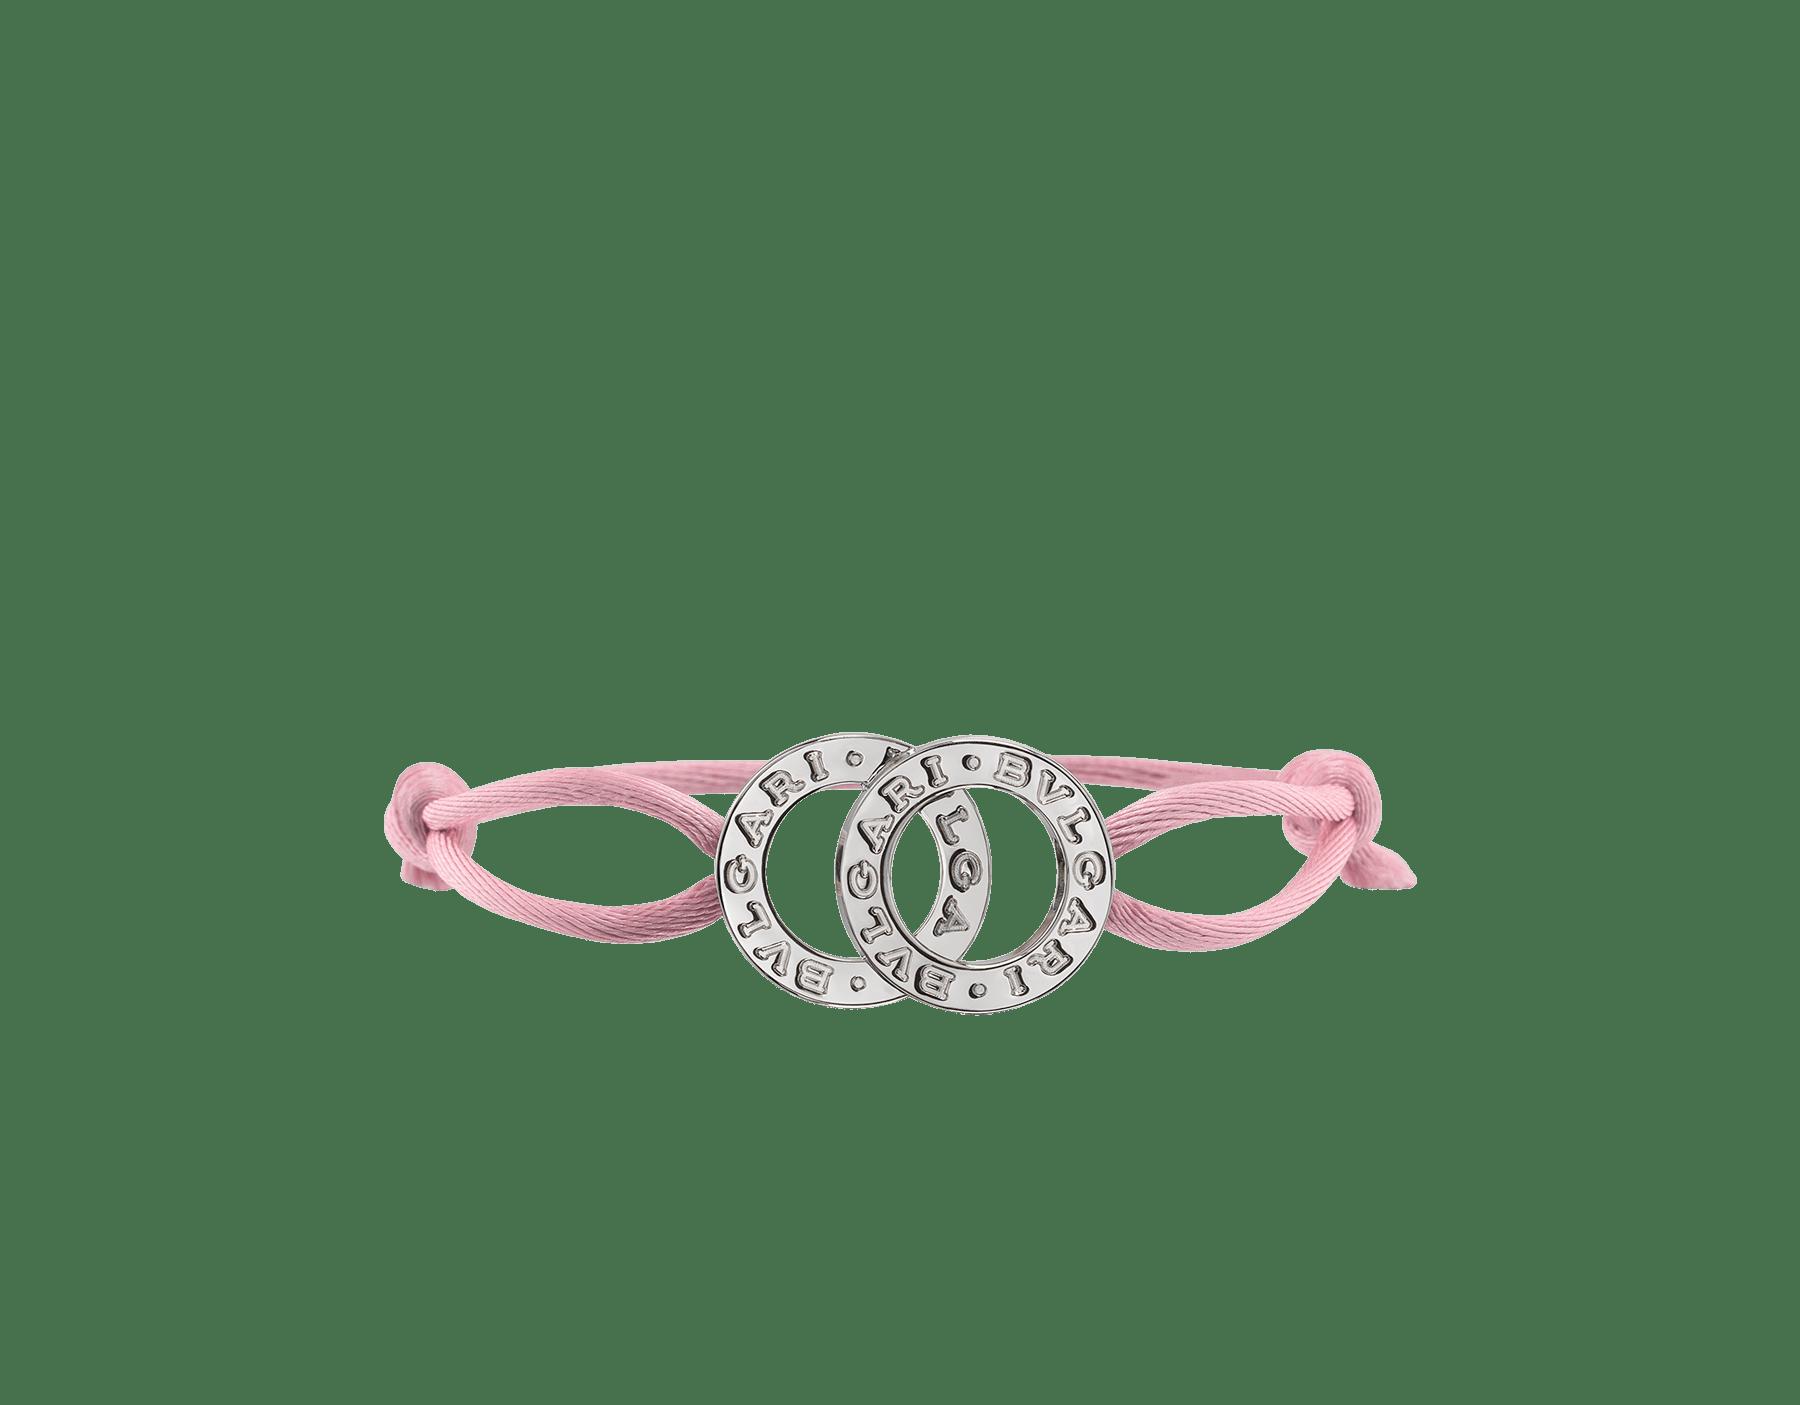 Bracelet BVLGARI BVLGARI en tissu couleur Flamingo Quartz avec logo Bvlgari Bvlgari emblématique en argent massif. 288451 image 1